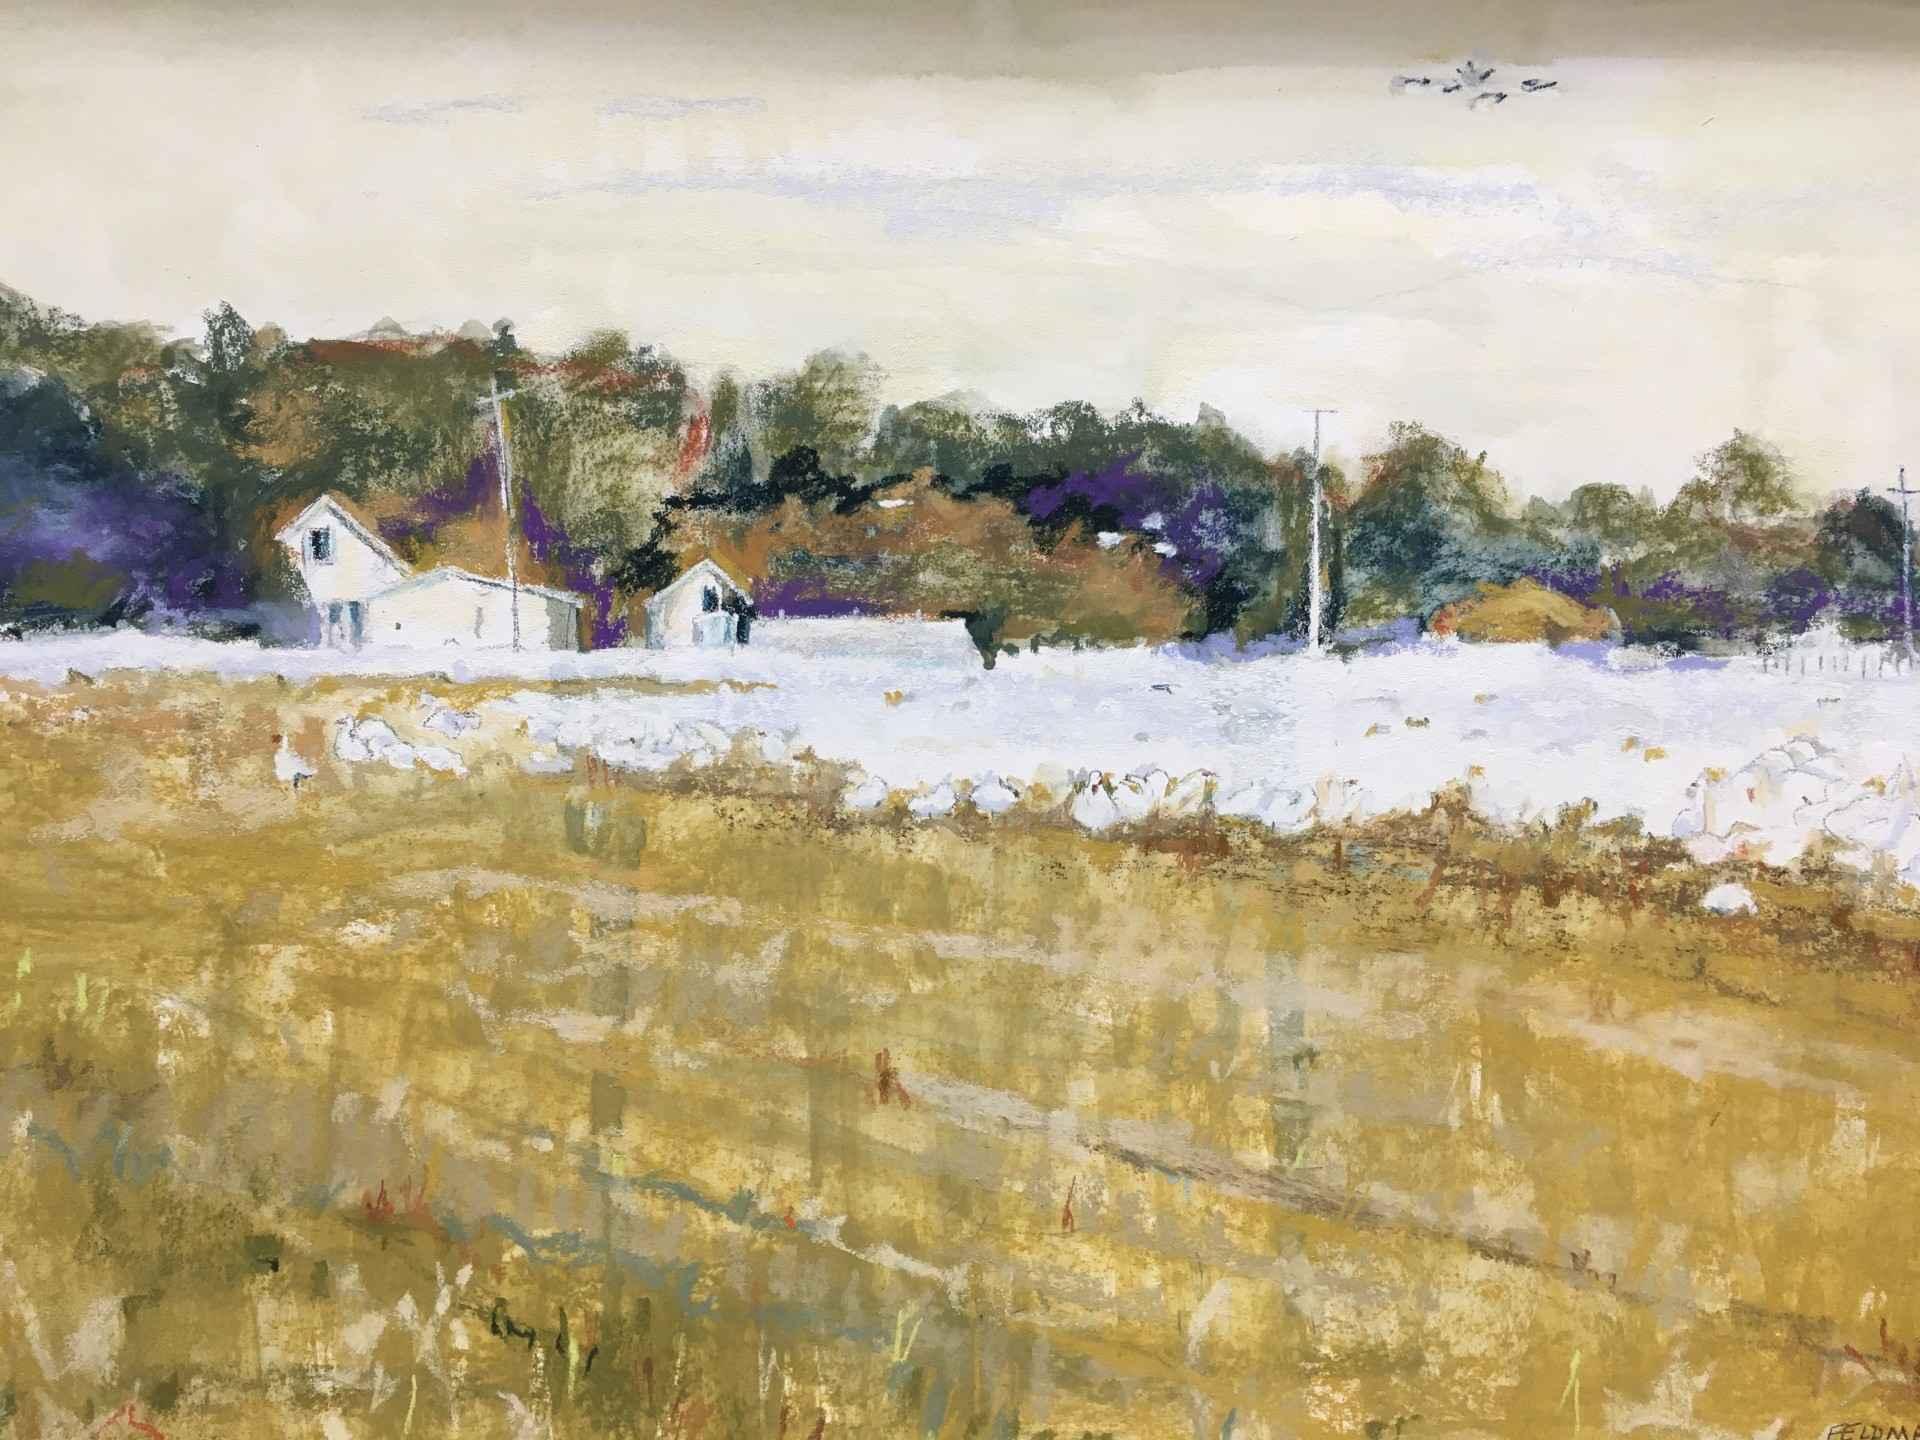 Snow Geese by  Marilyn Feldman - Masterpiece Online